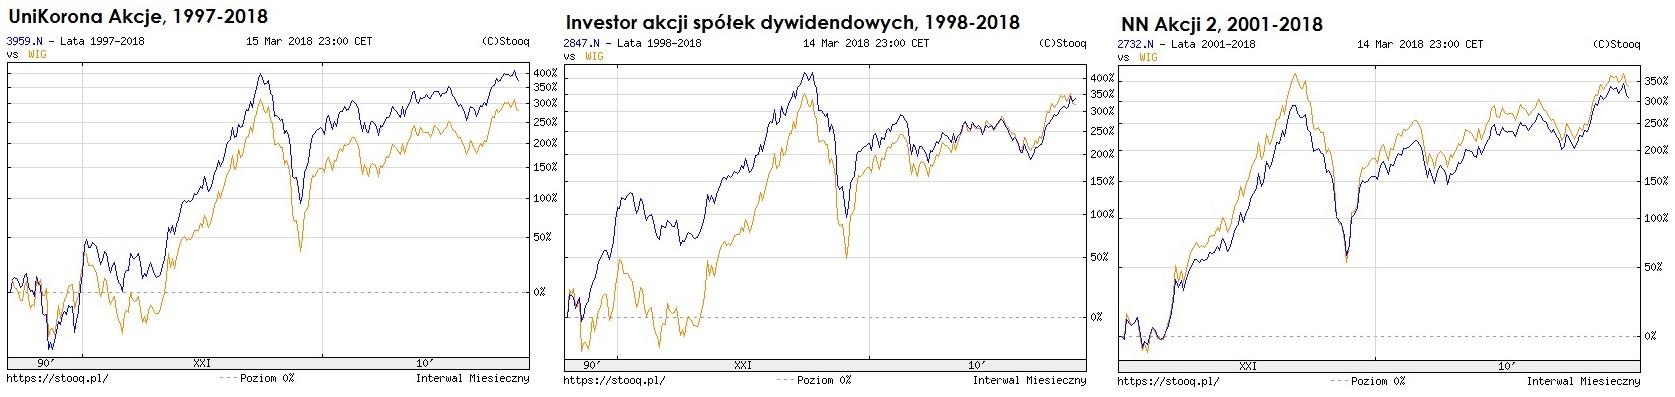 fundusze-akcji-najstarsze1